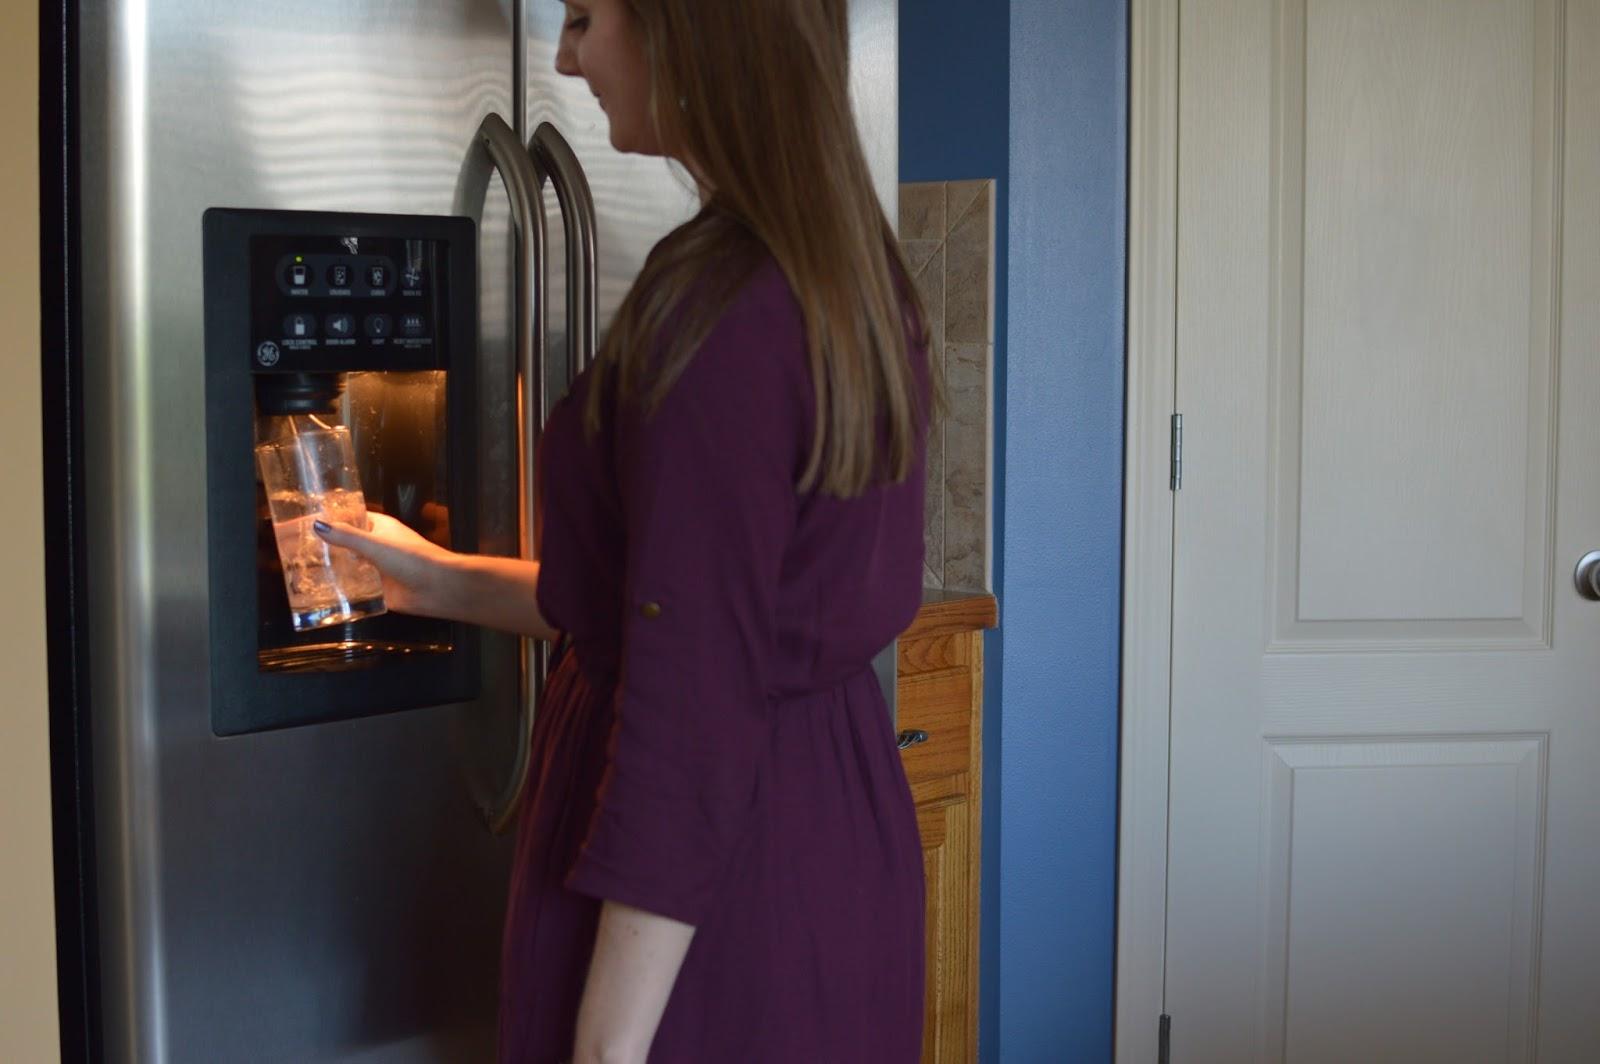 hydrate before you caffeinate